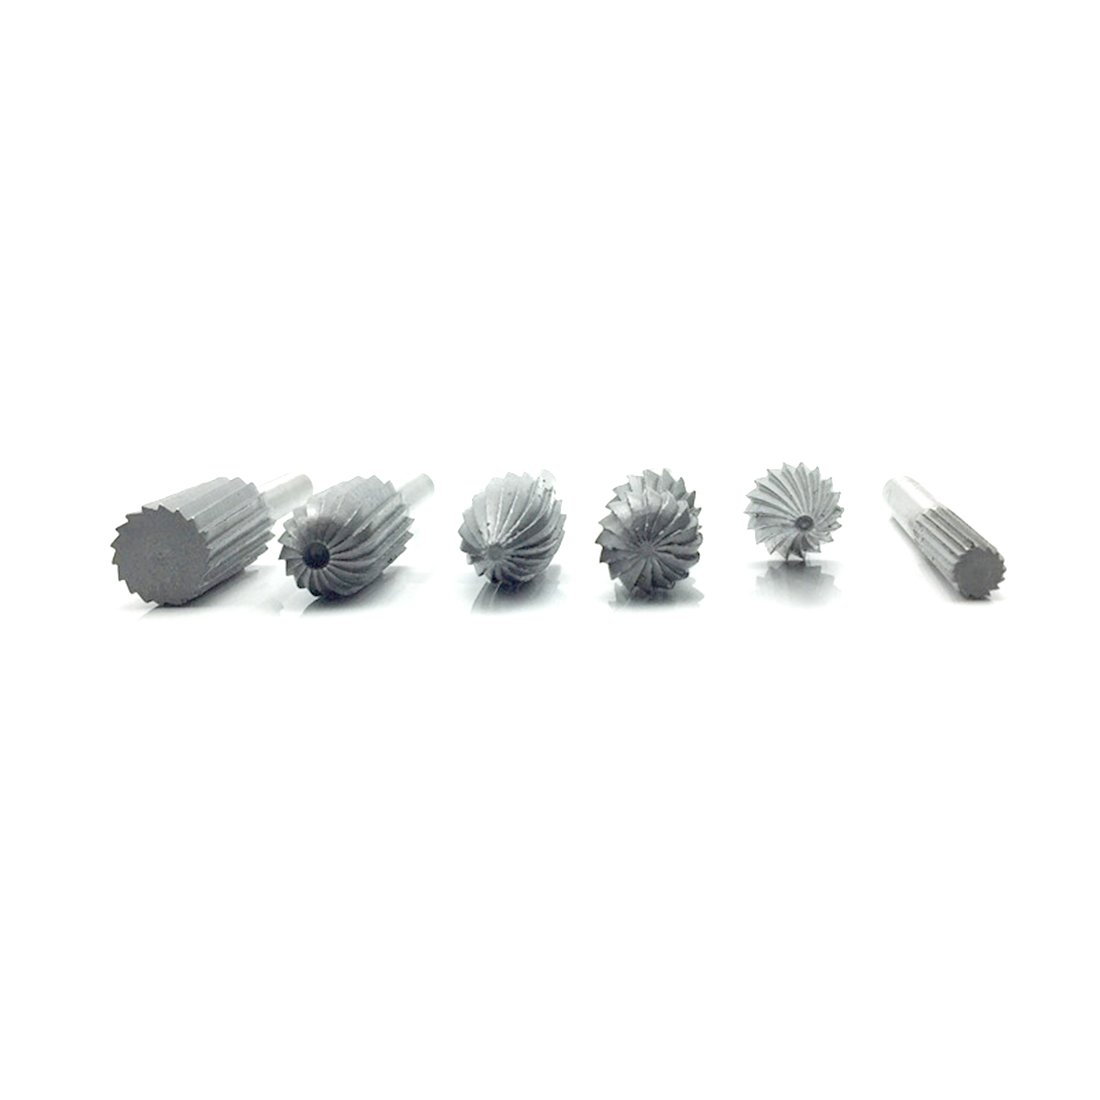 Amazon.com: Fresa de metal duro (Bit HSS Rotary Cutter ...